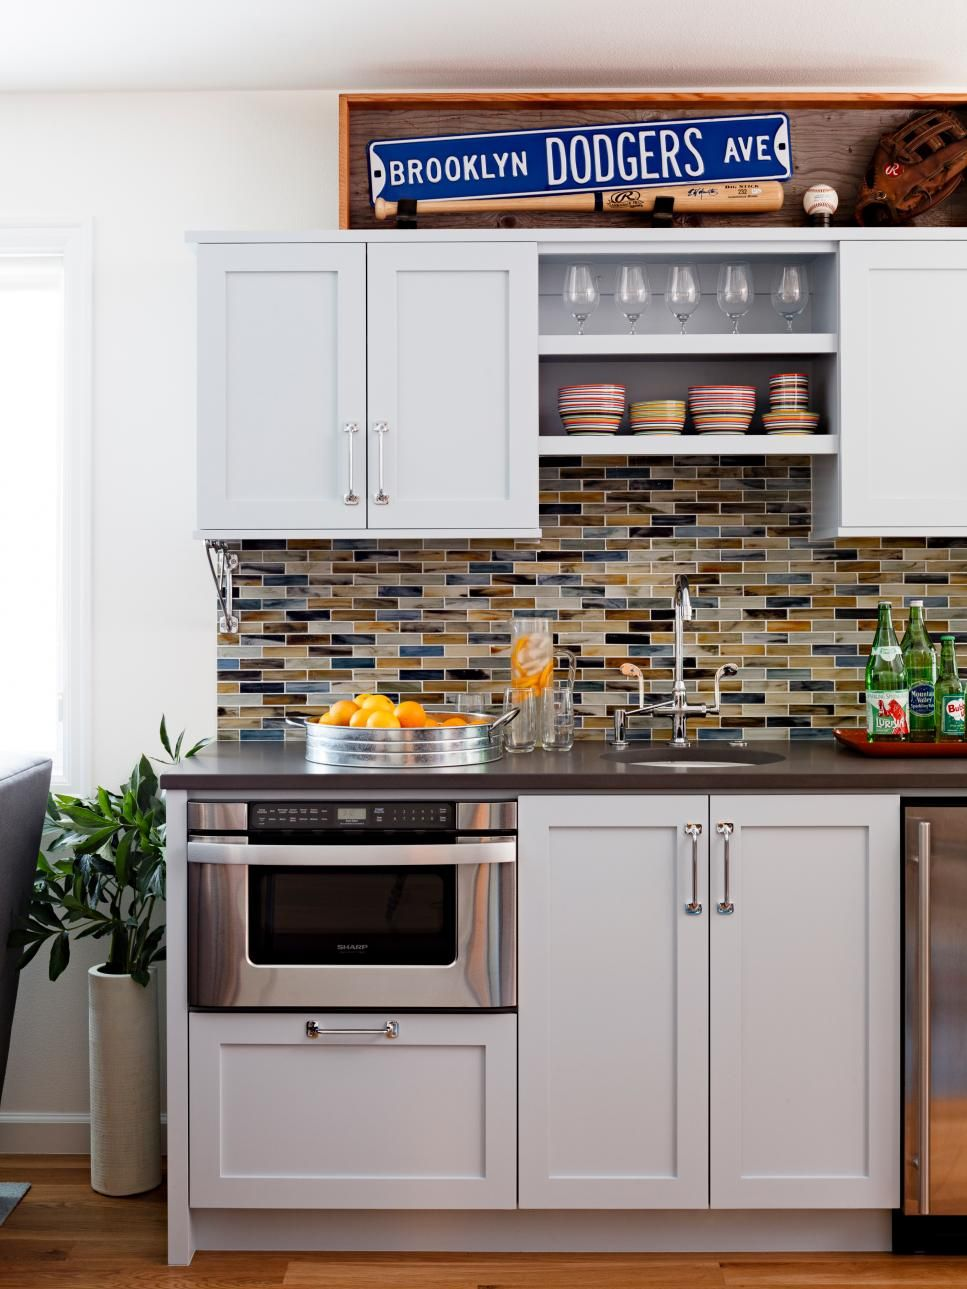 Kitchenette Ideas the remodeled basementmosaik design and fig studio also